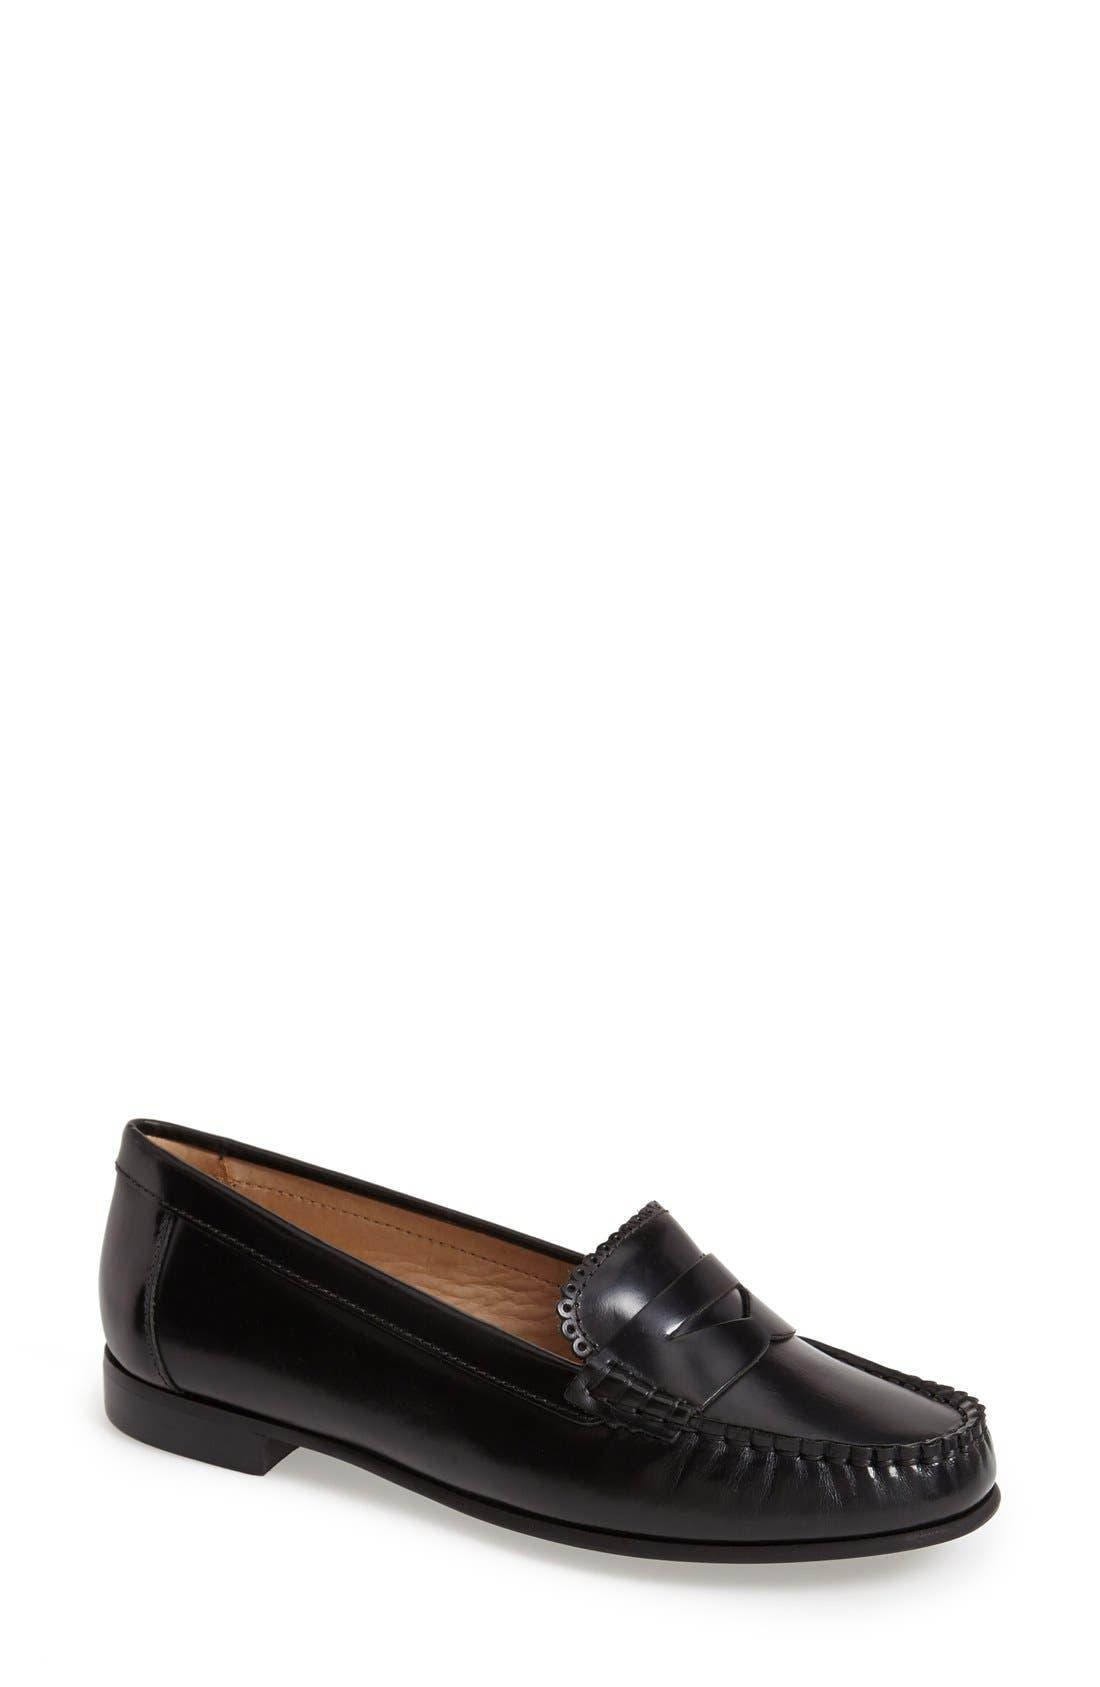 Alternate Image 1 Selected - Jack Rogers 'Quinn' Leather Loafer (Women)